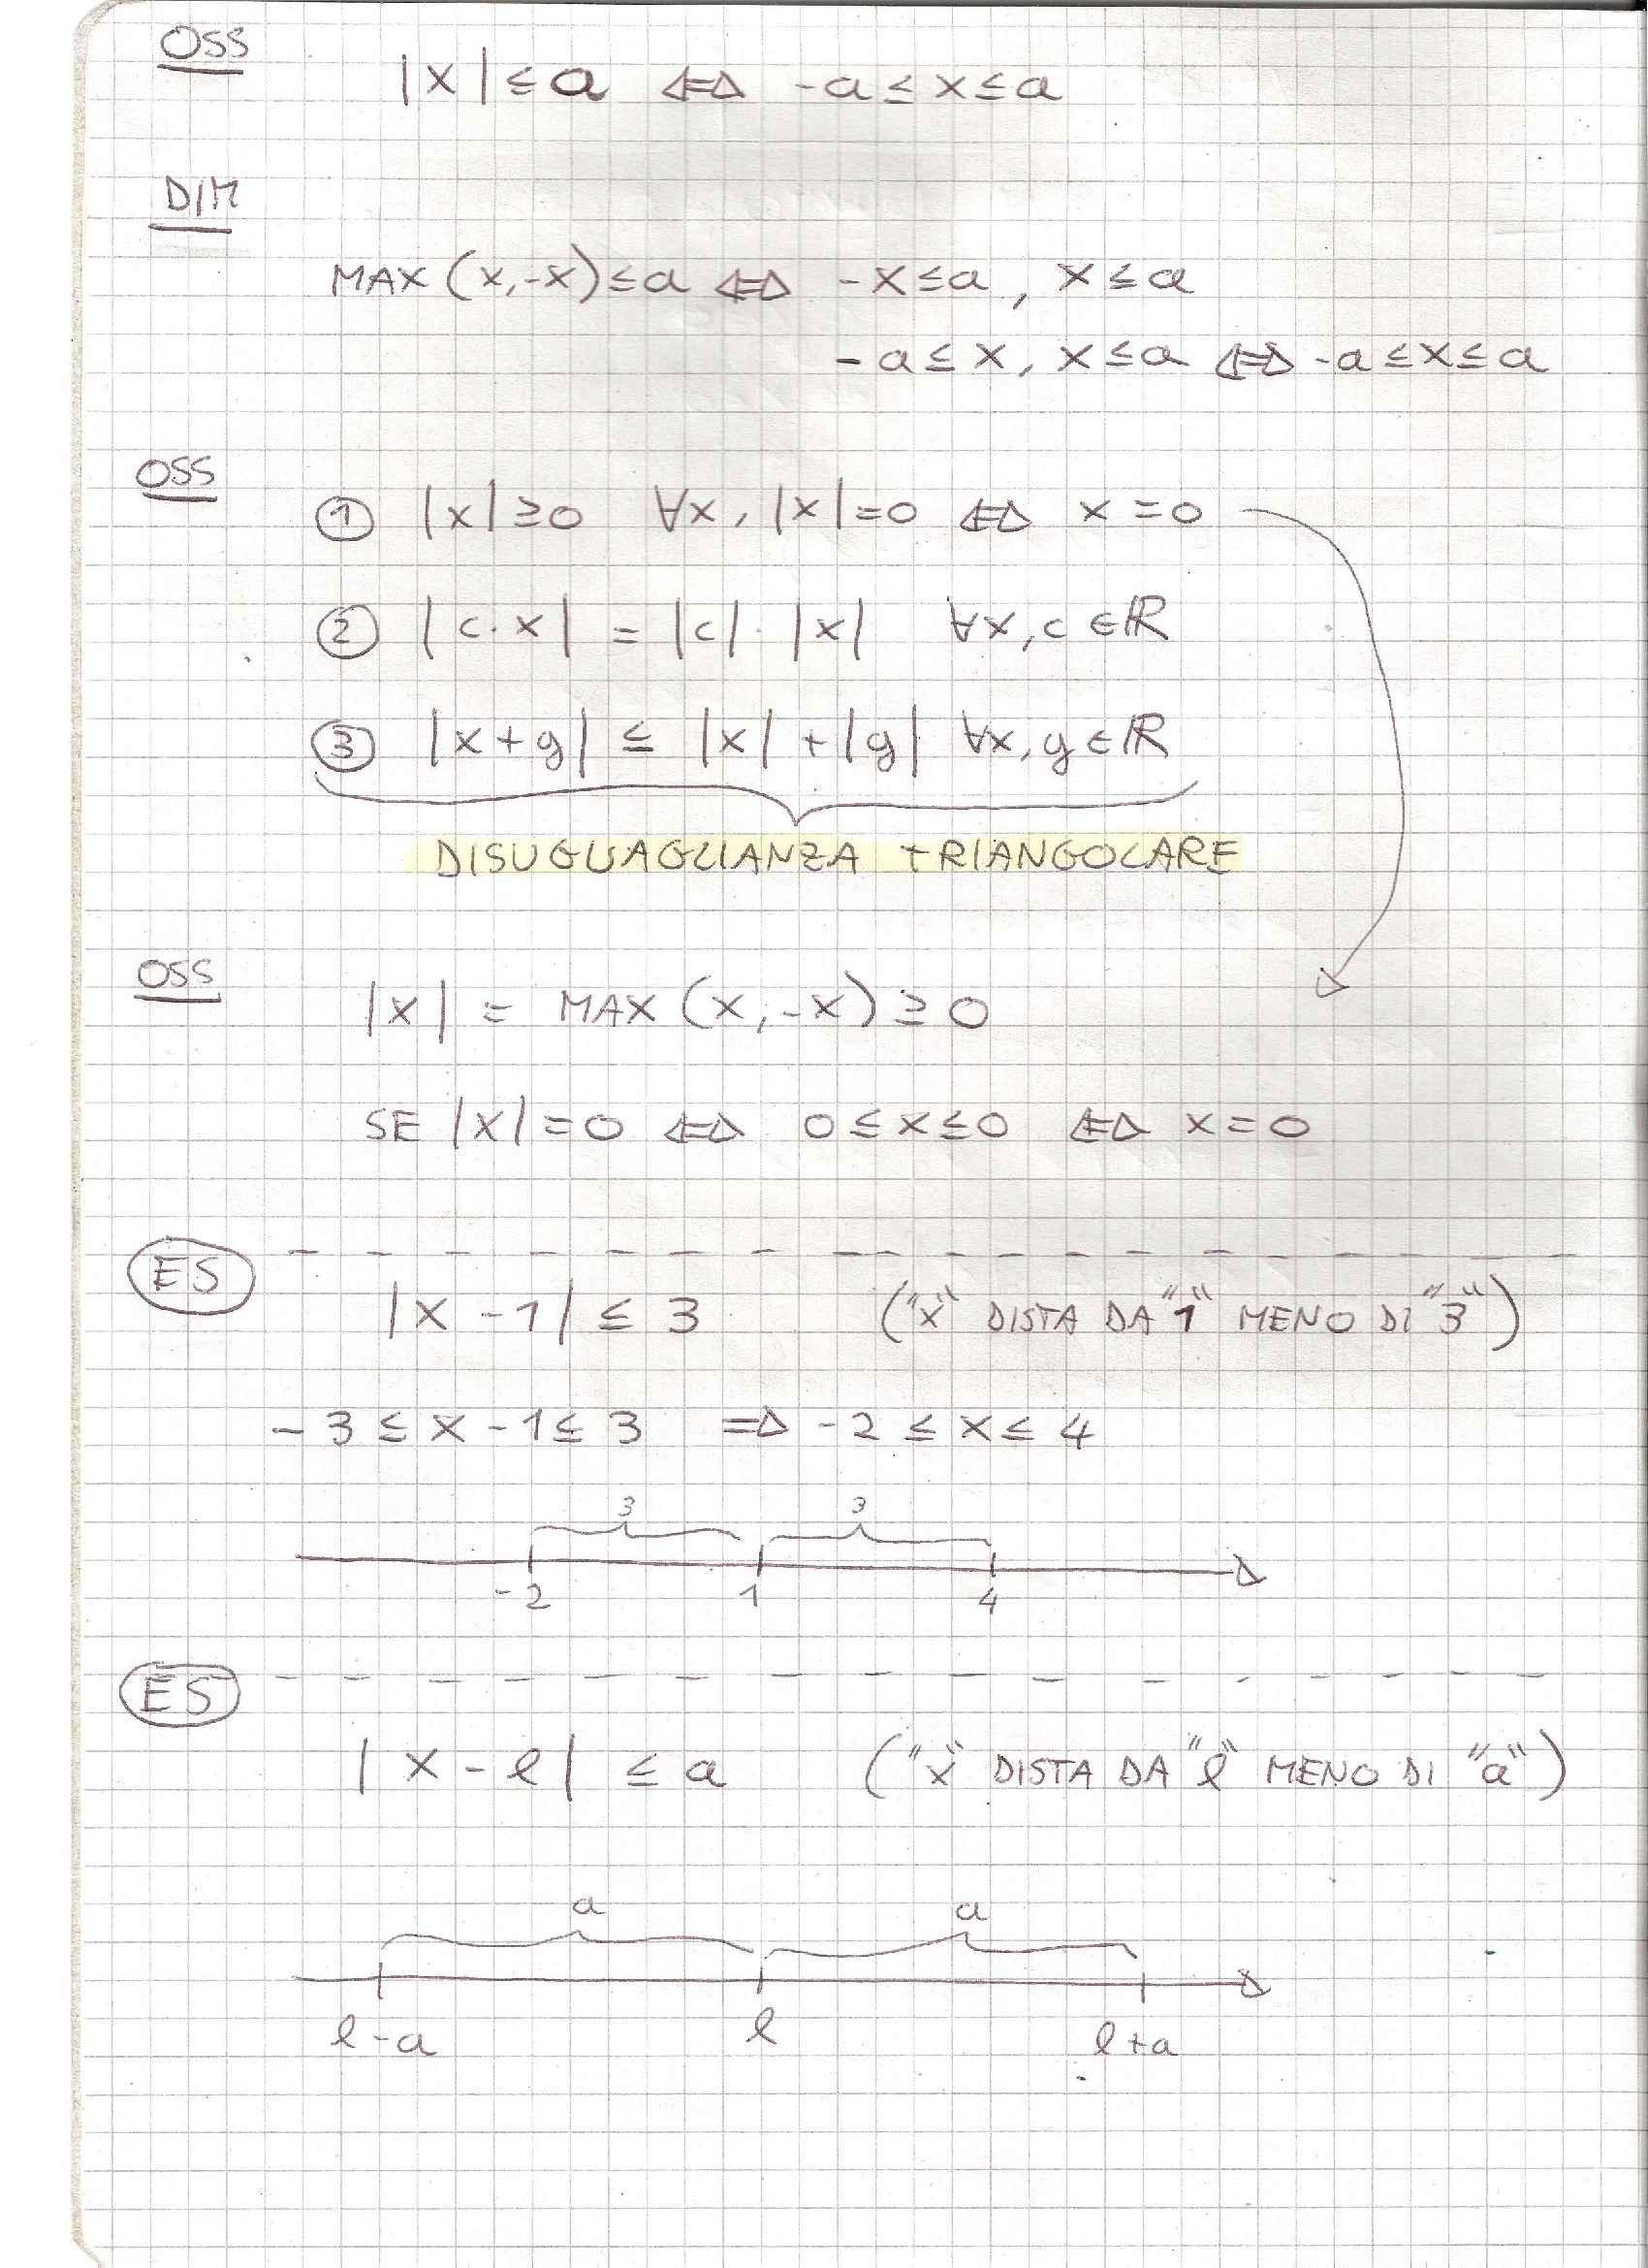 Analisi Matematica - Appunti Pag. 2